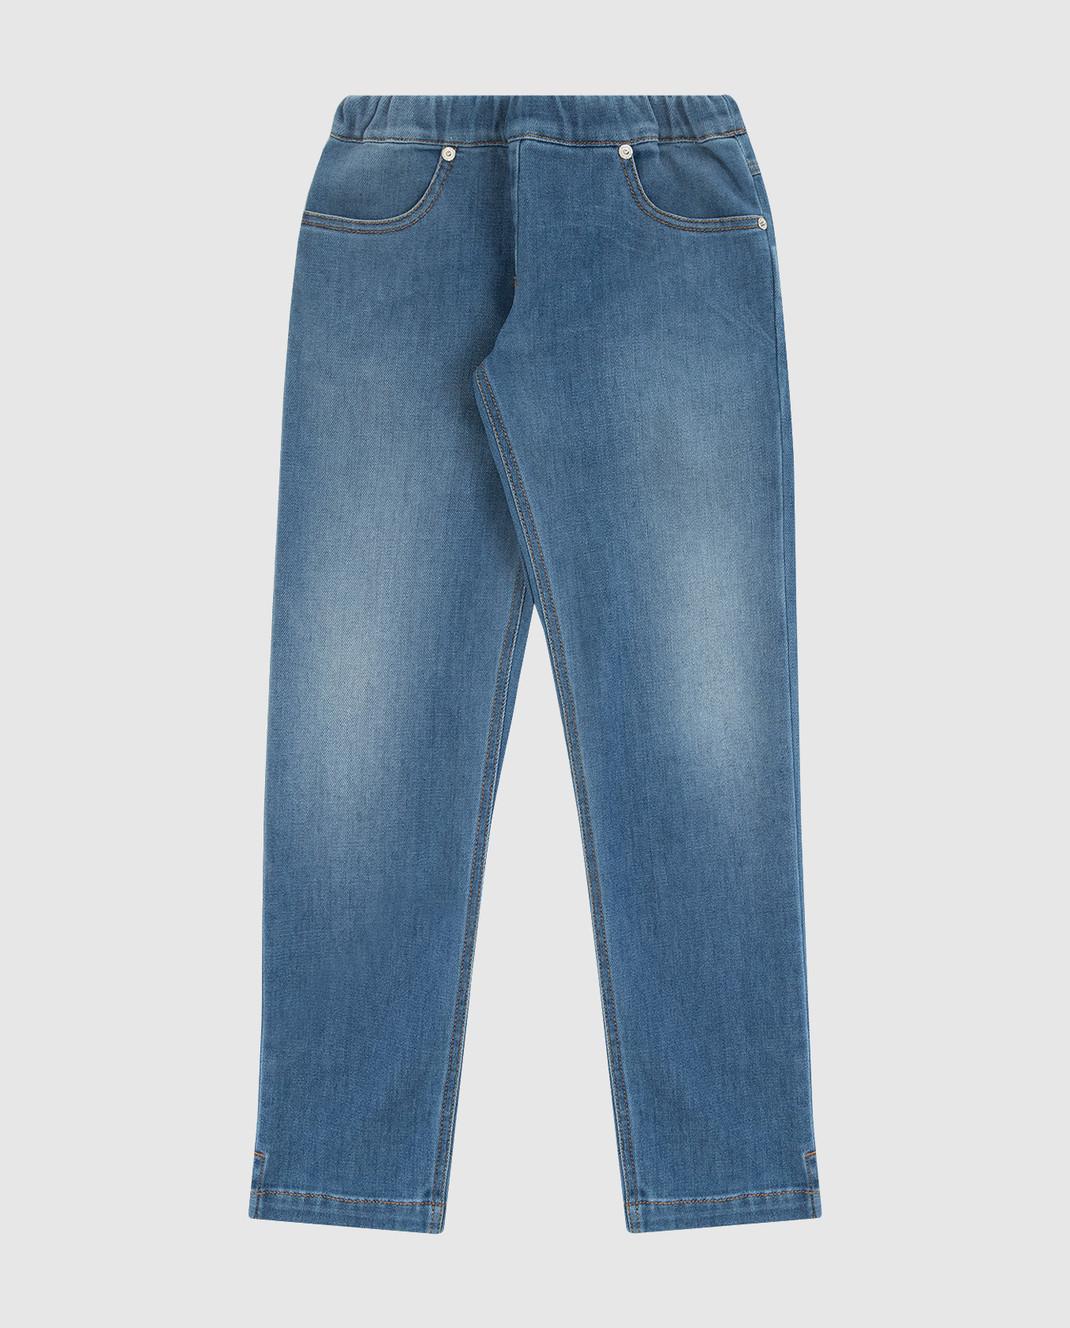 Ermanno Scervino Детские синие джинсы JL081012